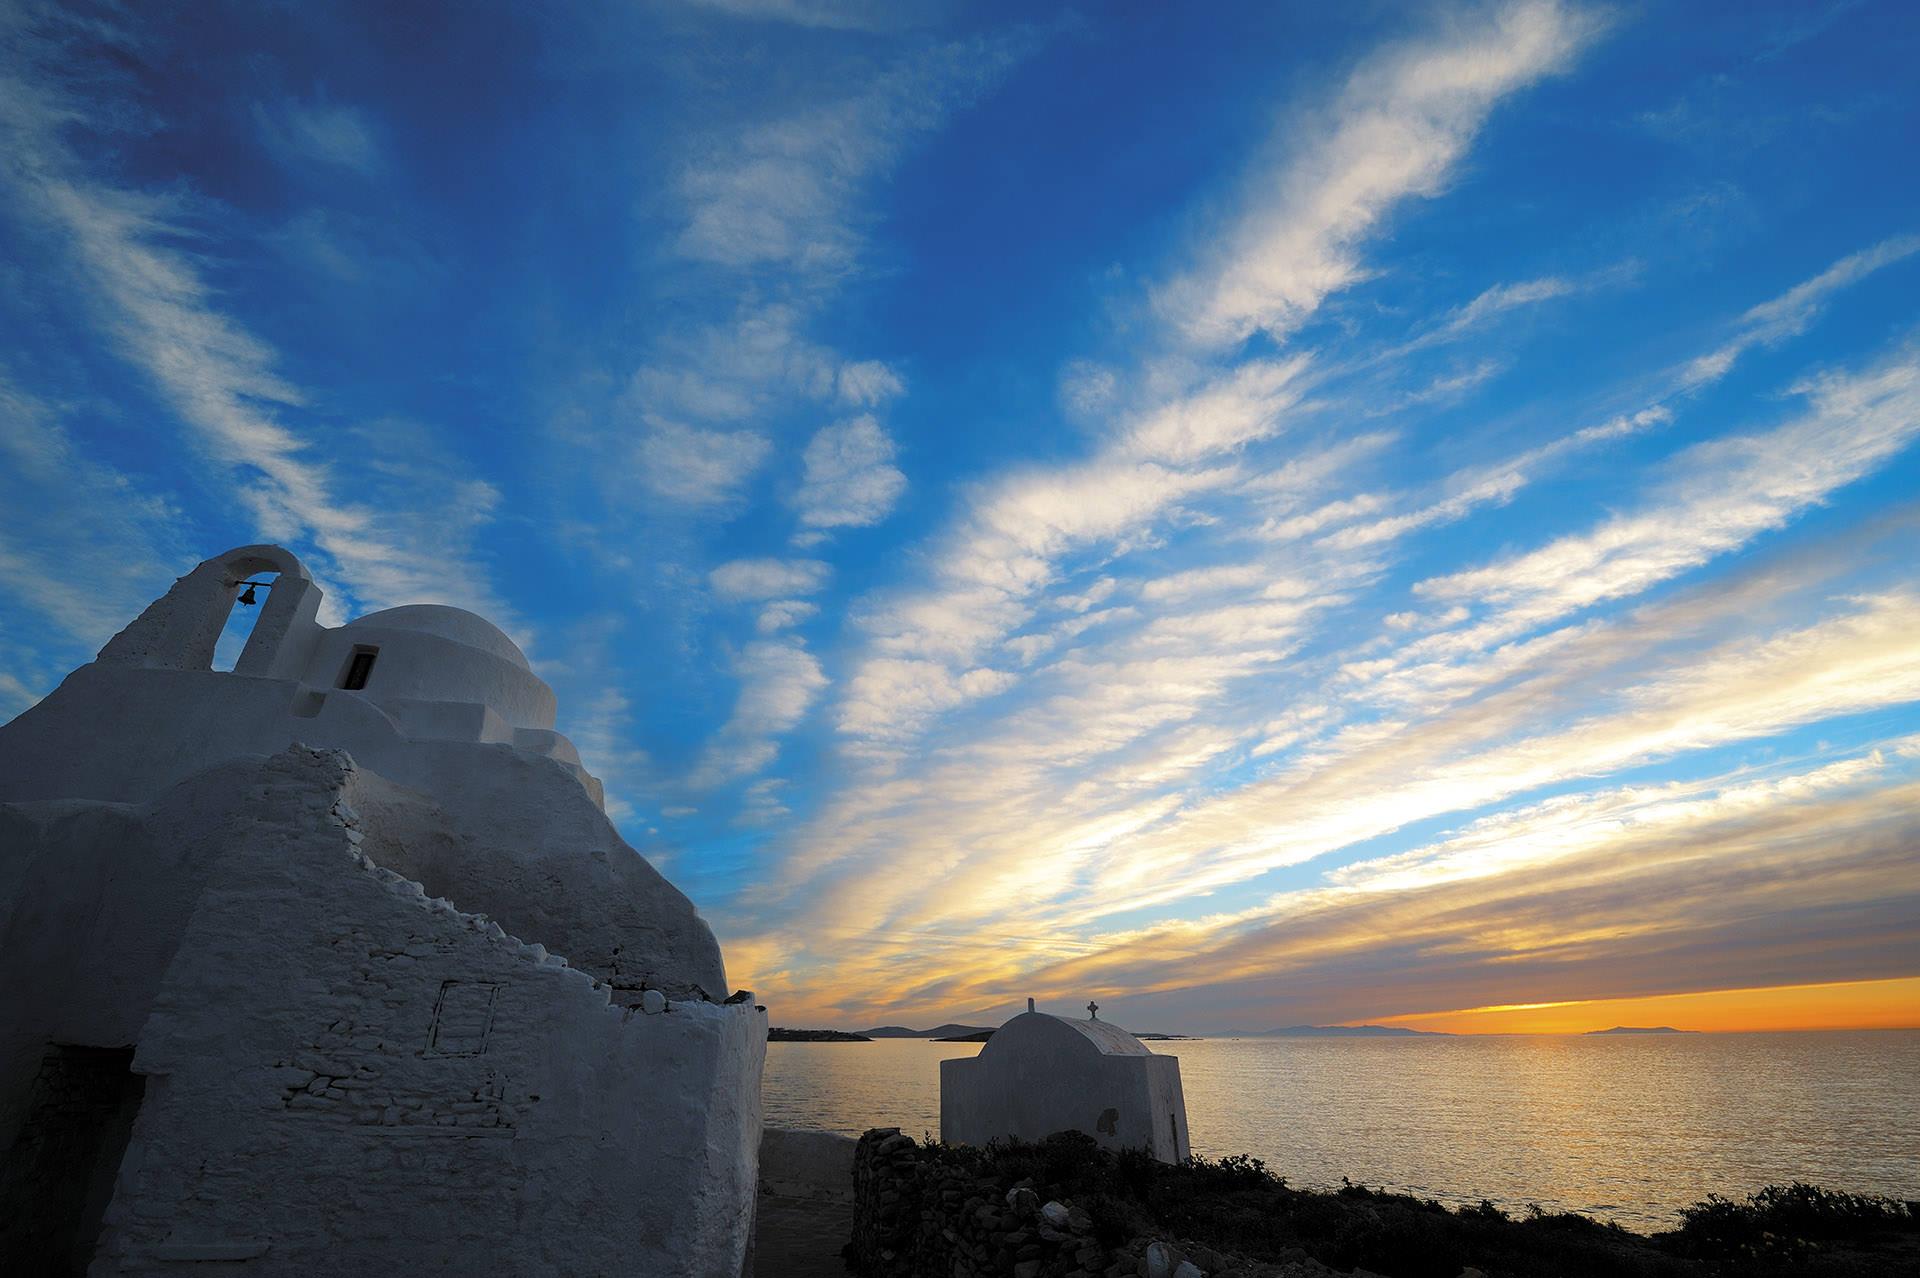 Hermes Mykonos Hotel - Mykonos Island